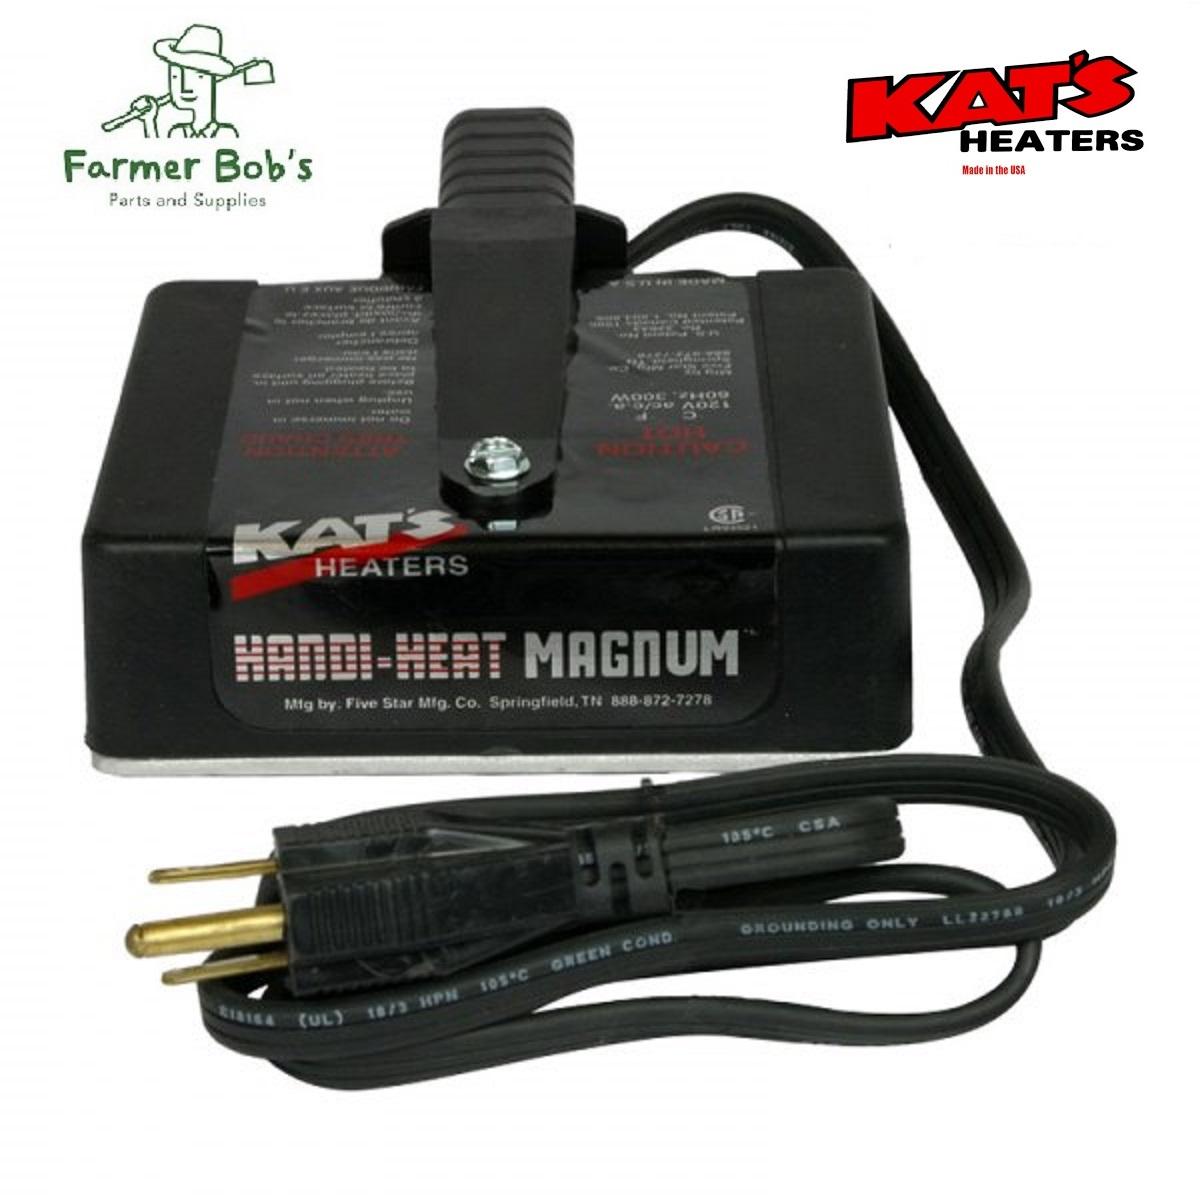 Kats Oil /& Transmission Heater Pan Heating Pad 1200 Watt 120 Volt Farmer Bobs Parts HP100